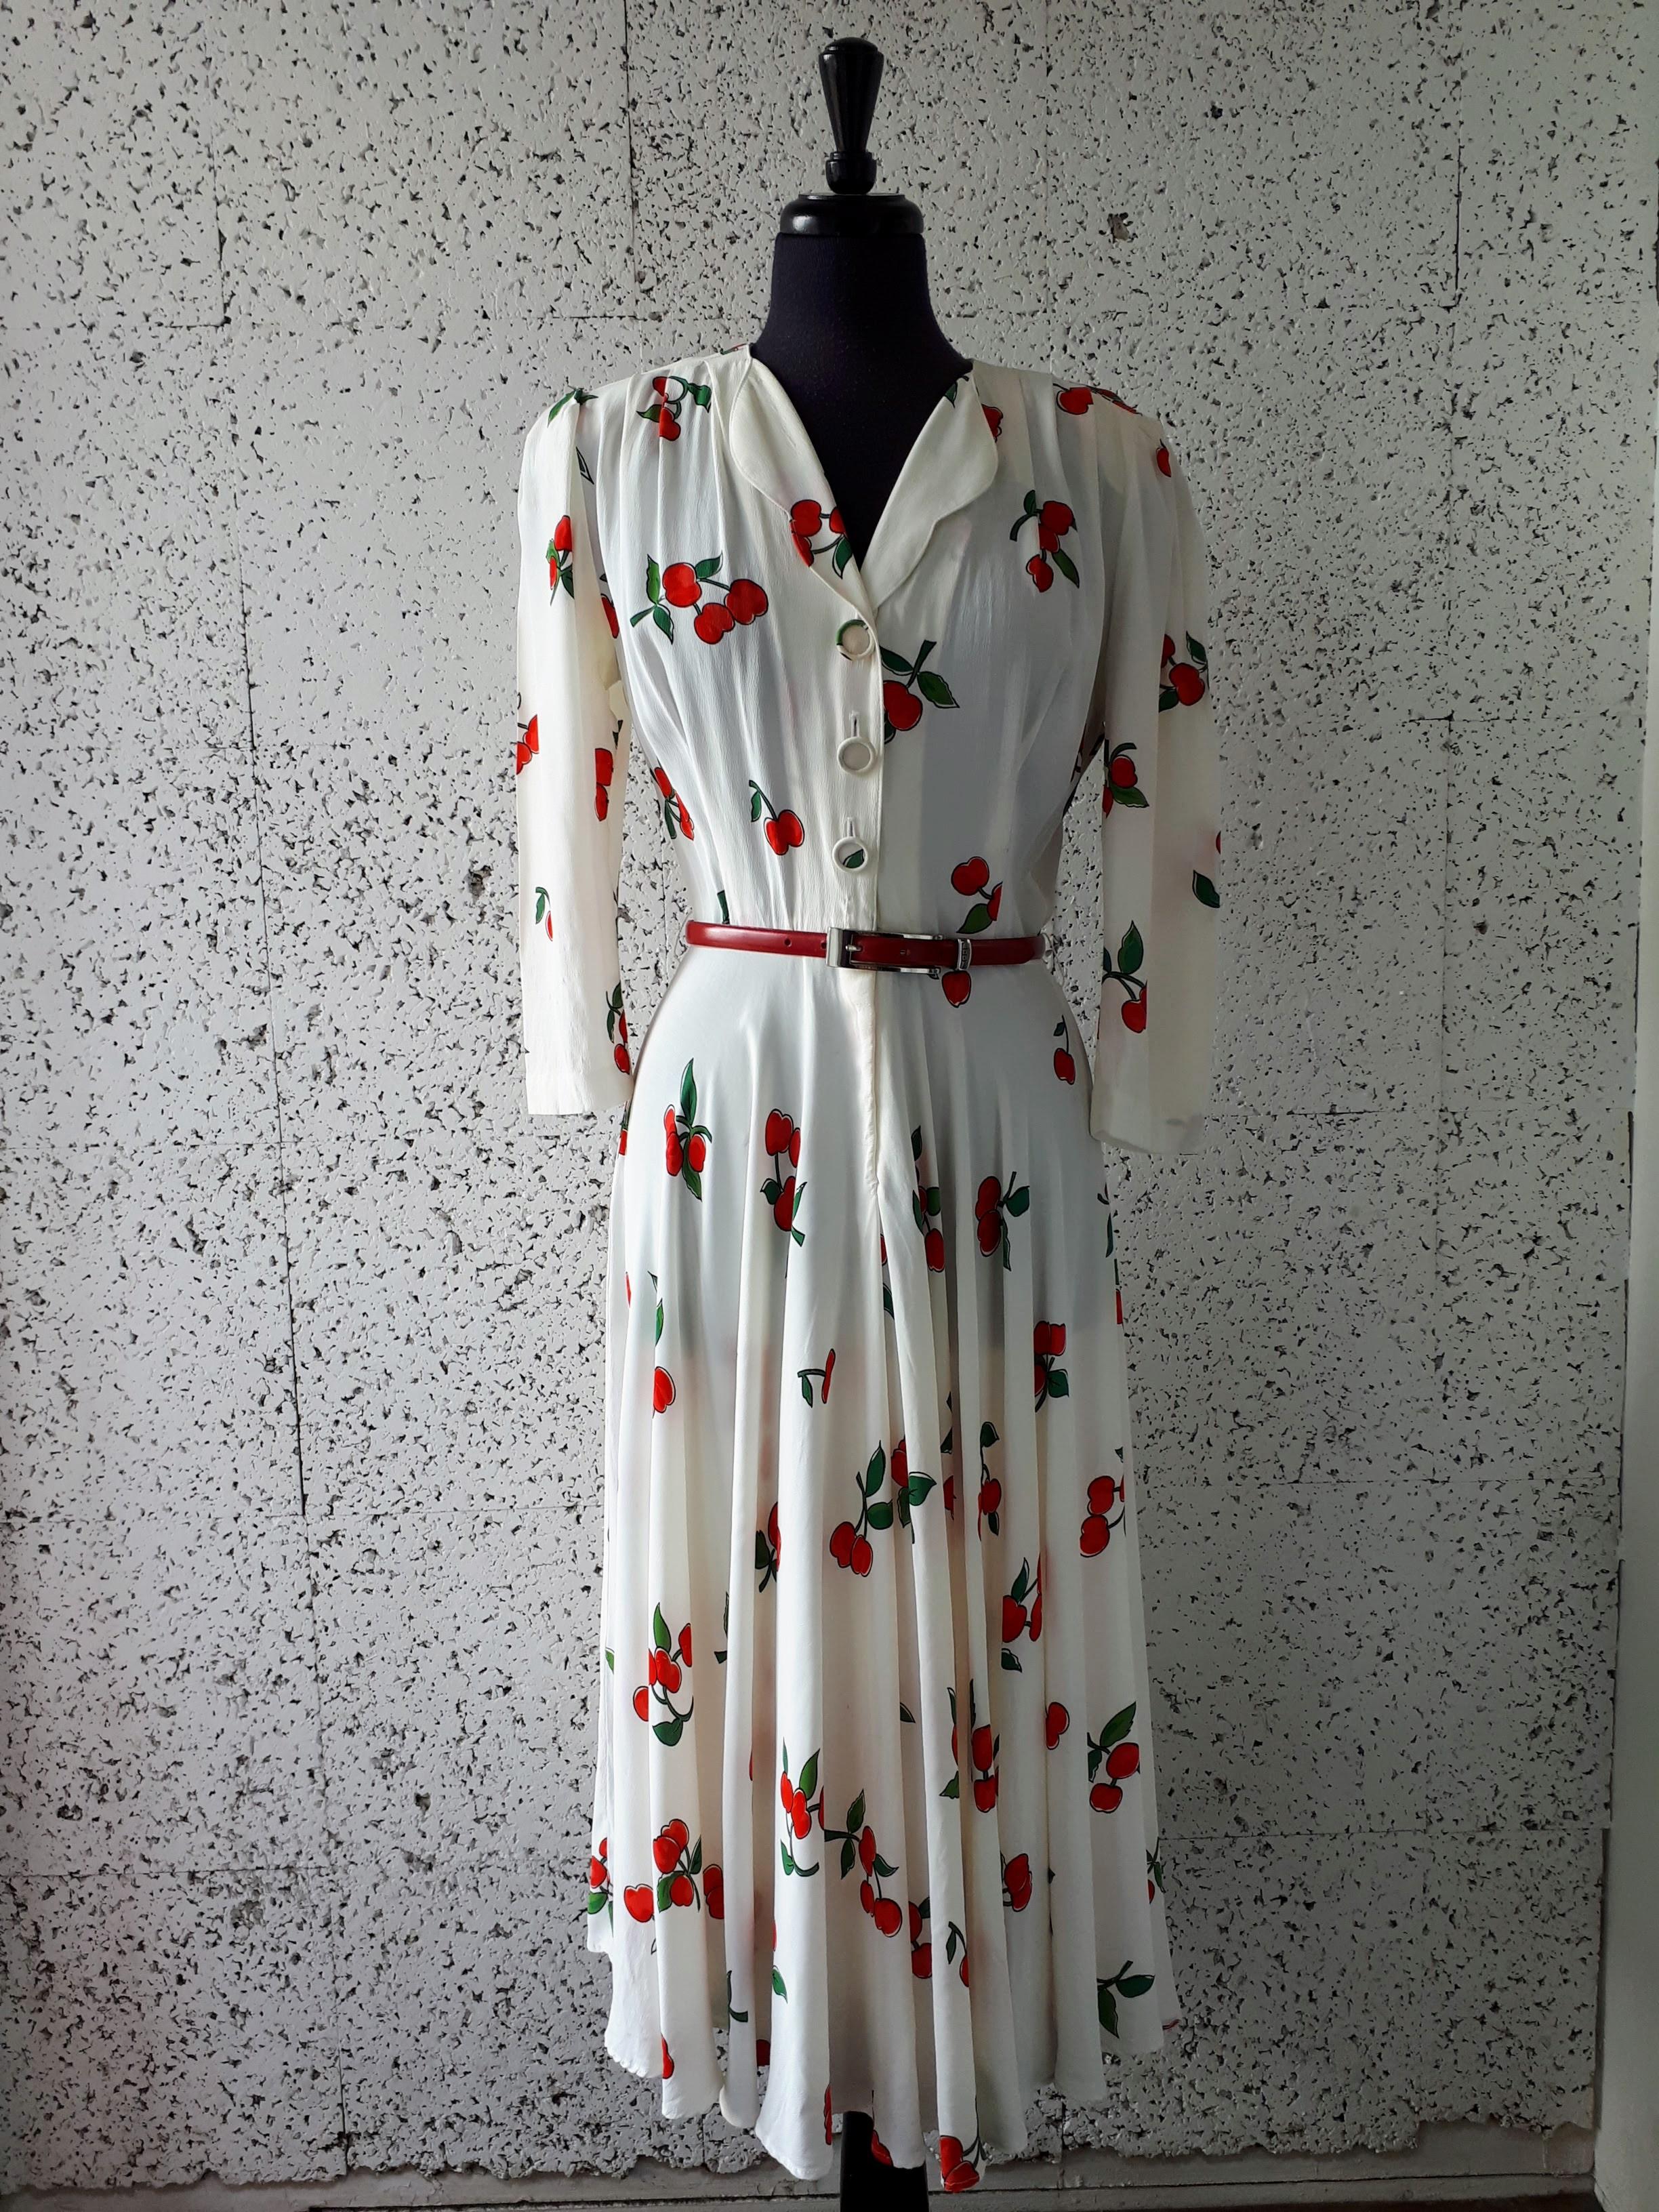 Saint Tropez West dress; Size 6, $42